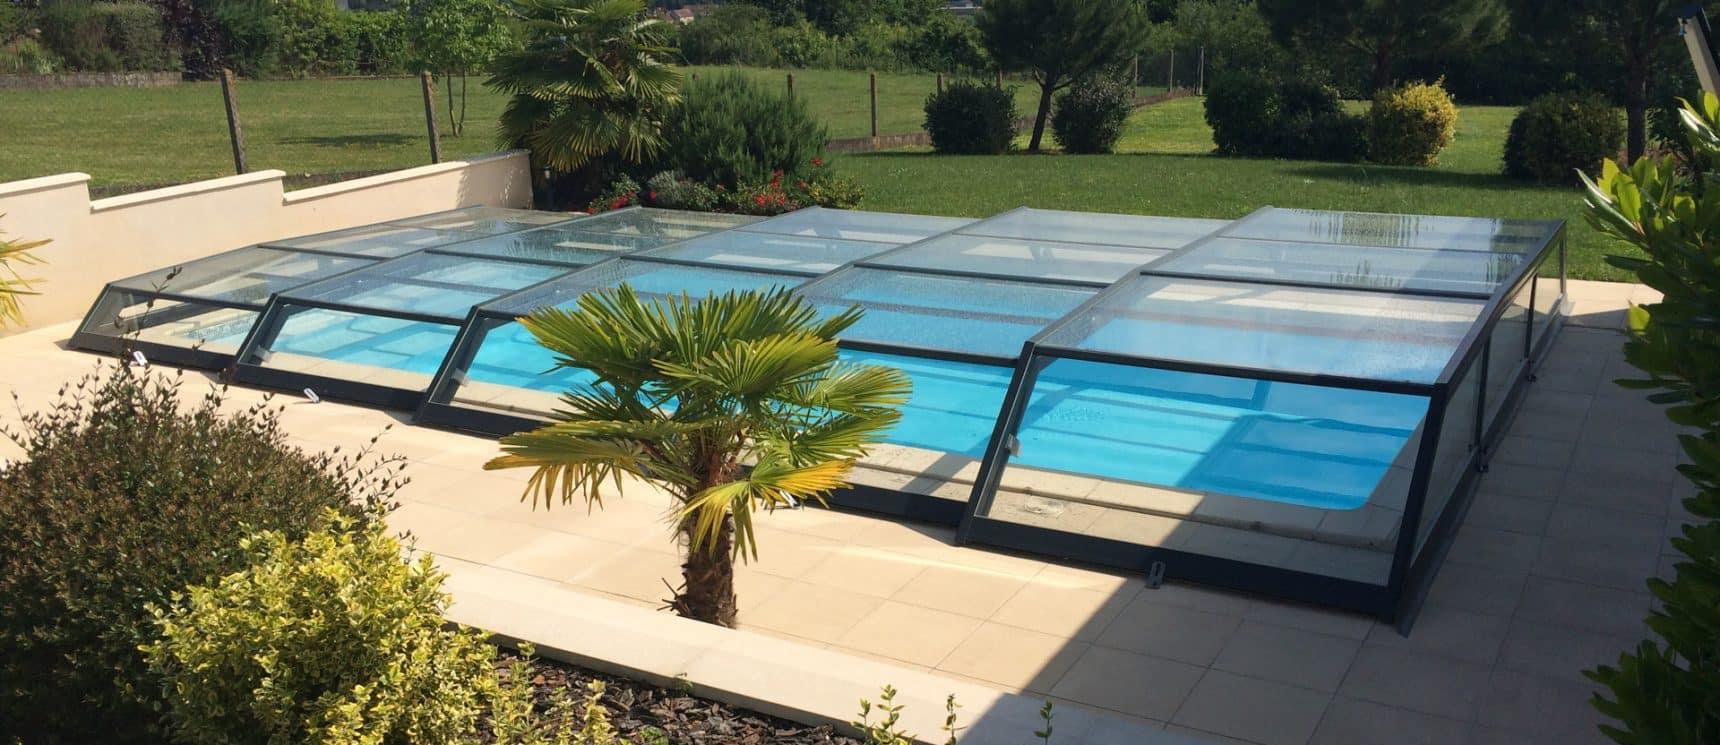 Iris Low Level Pool Enclosure - Pool Enclosure concernant Piscine Epdm